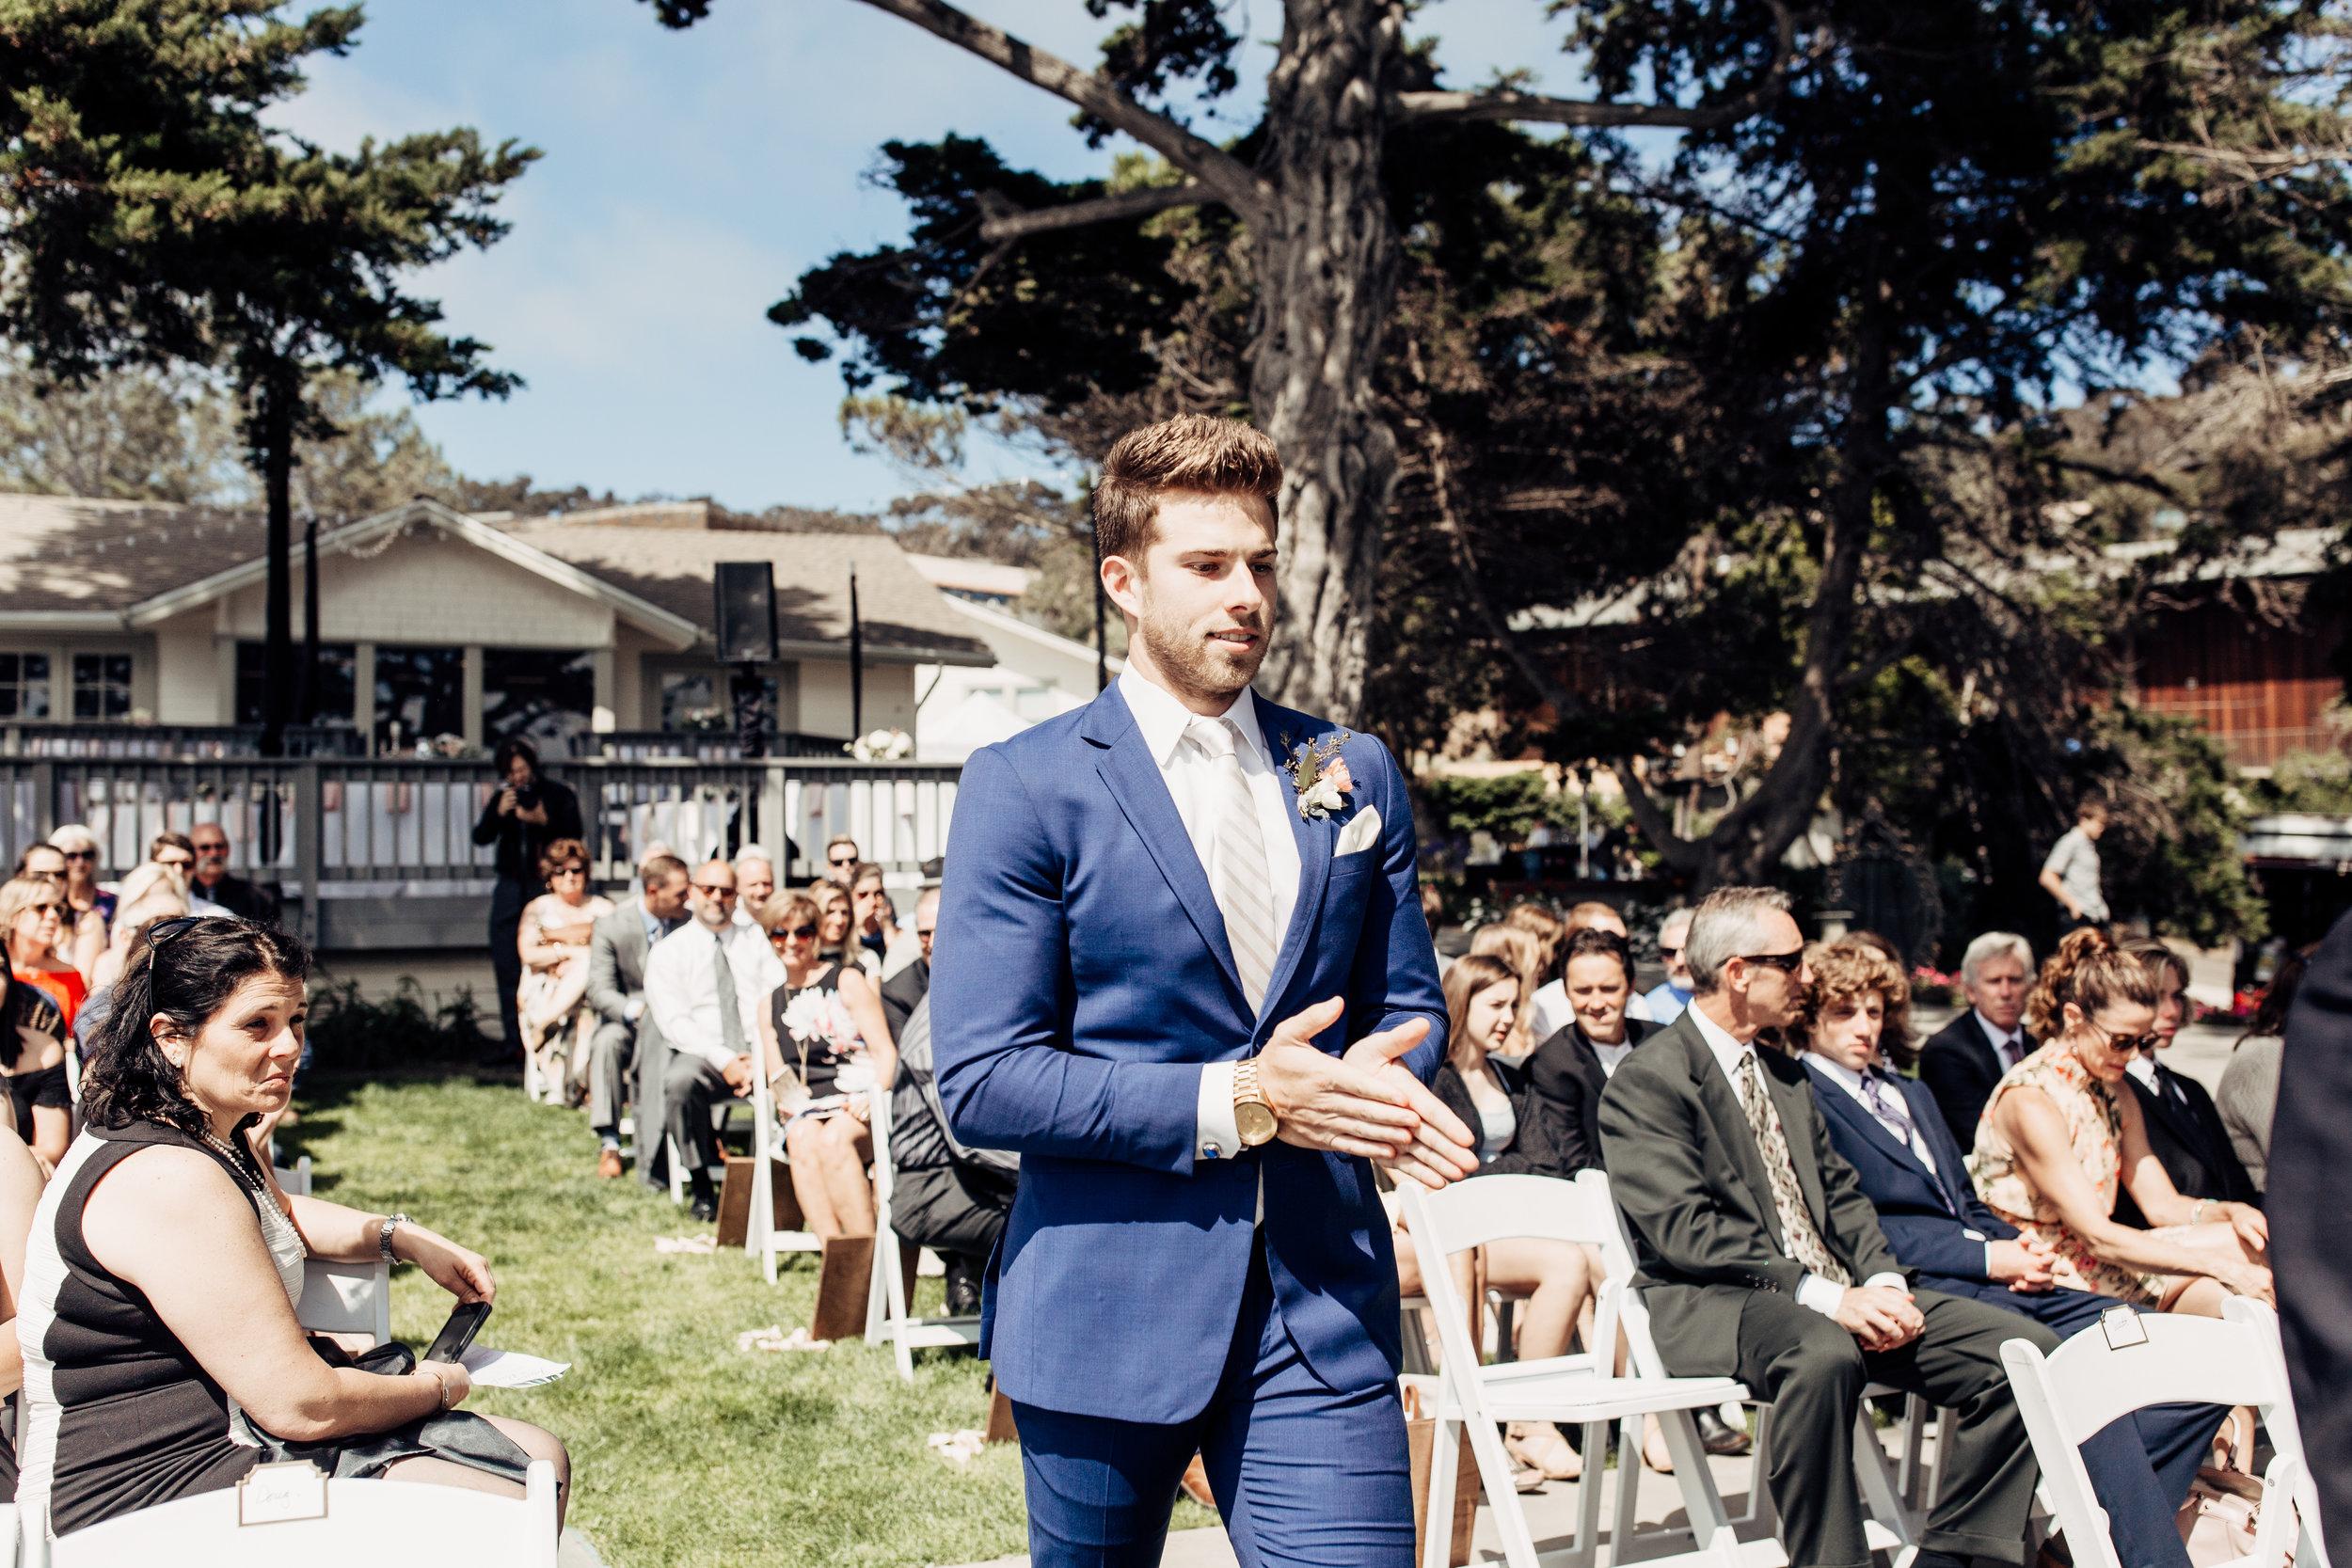 martin-johnson-house-wedding-san-diego4229.jpg